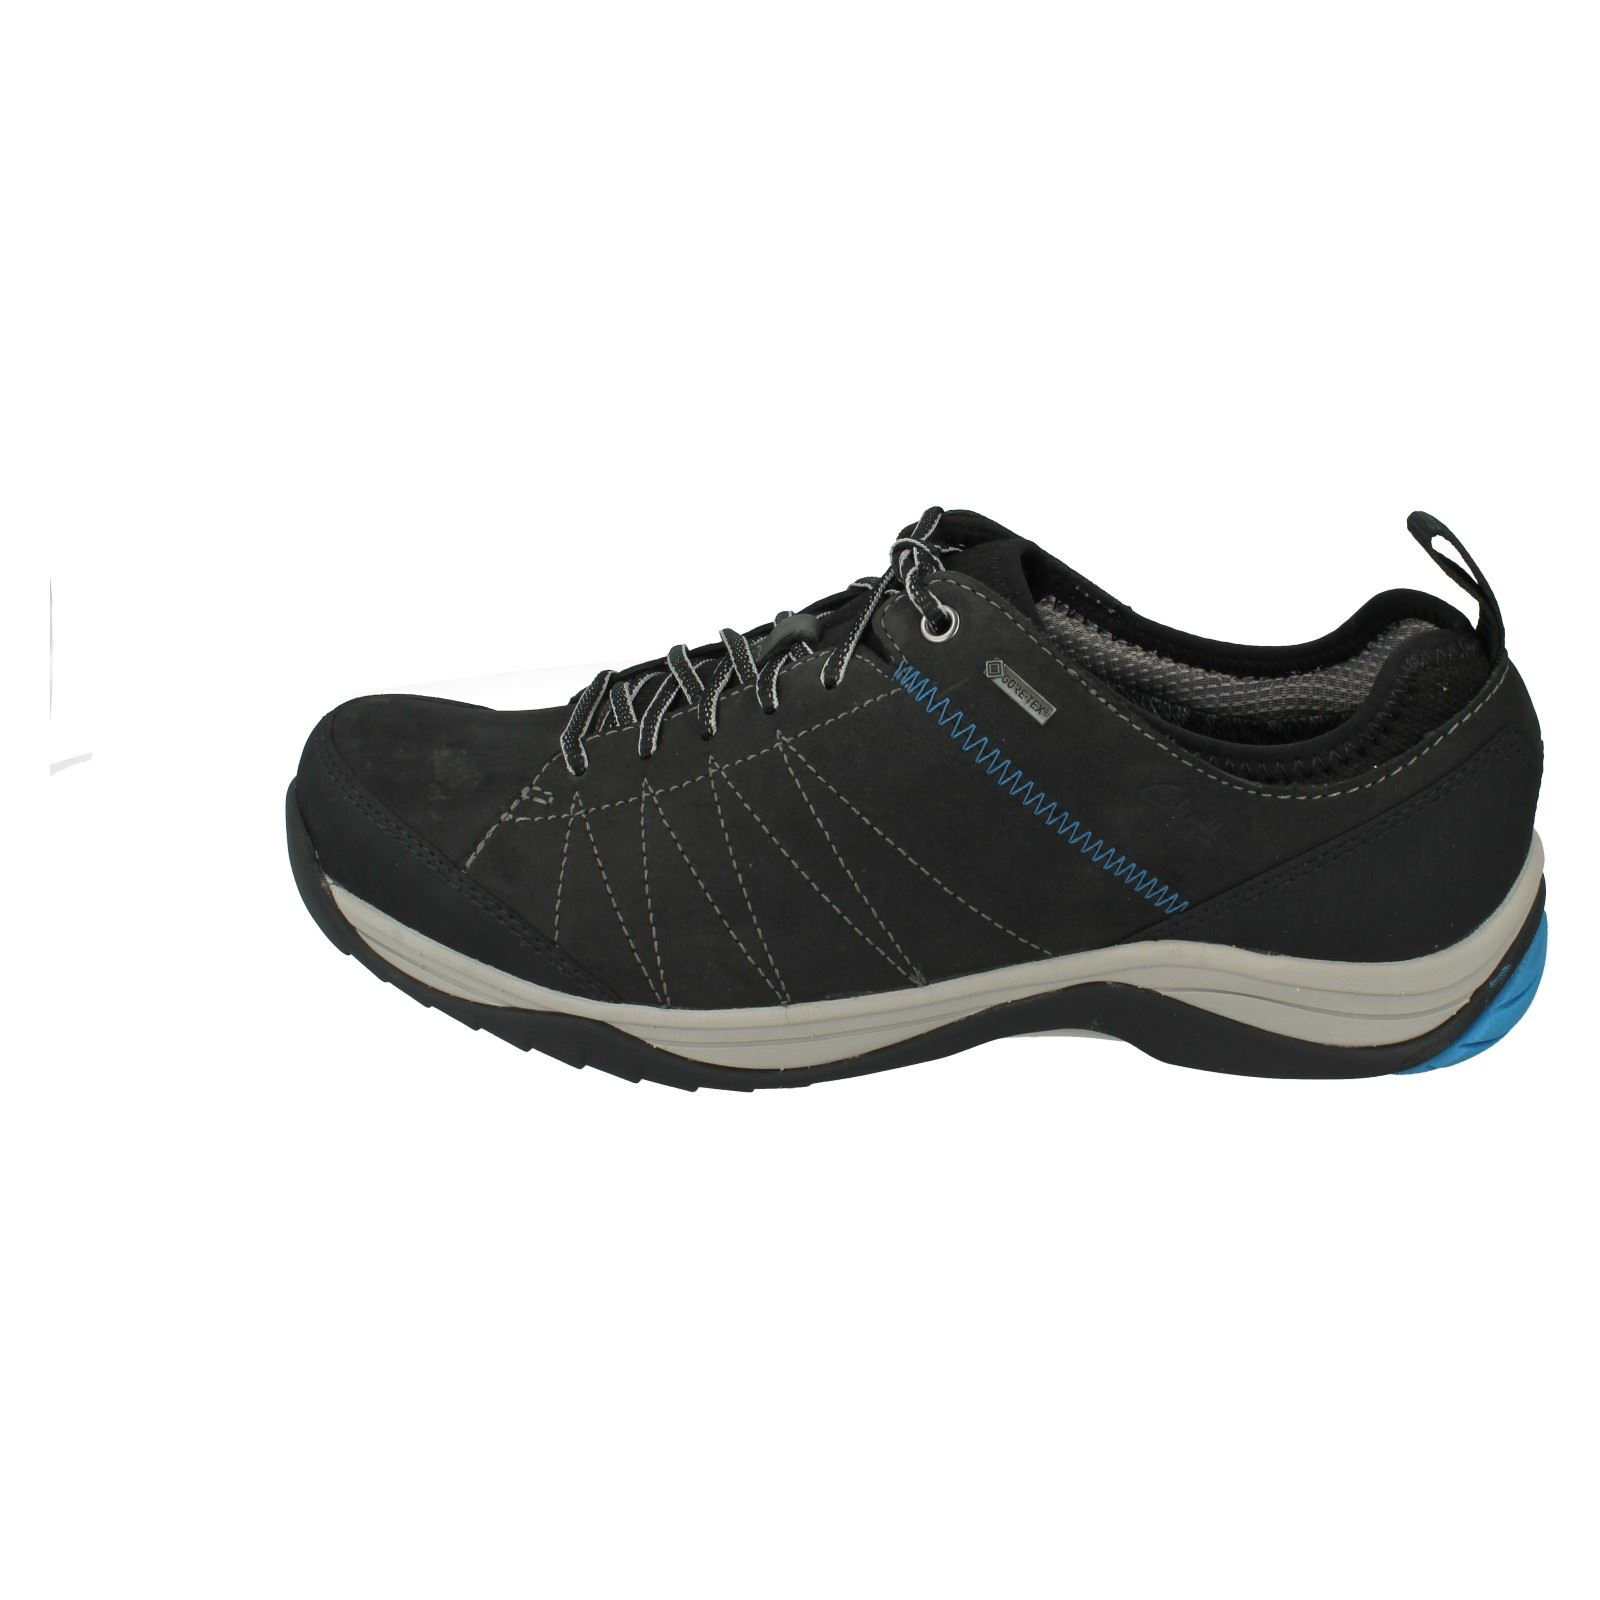 Clarks Gore Tex Mens Shoes